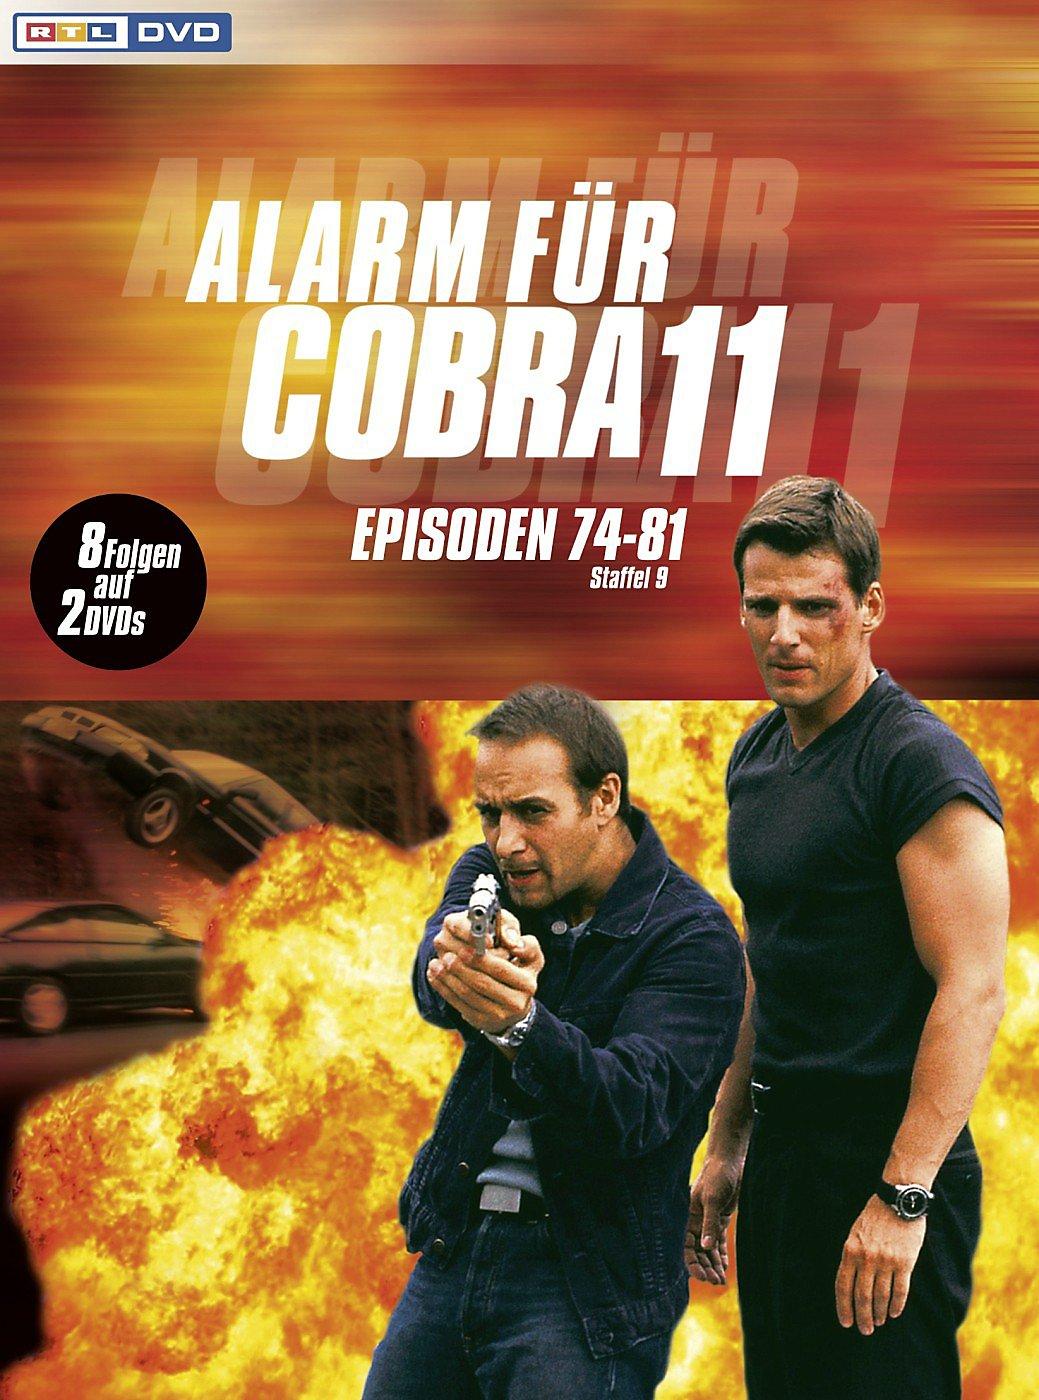 Andrea Schäfer Cobra 11 alarm für cobra 11 - staffel 9 dvd bei weltbild.de bestellen